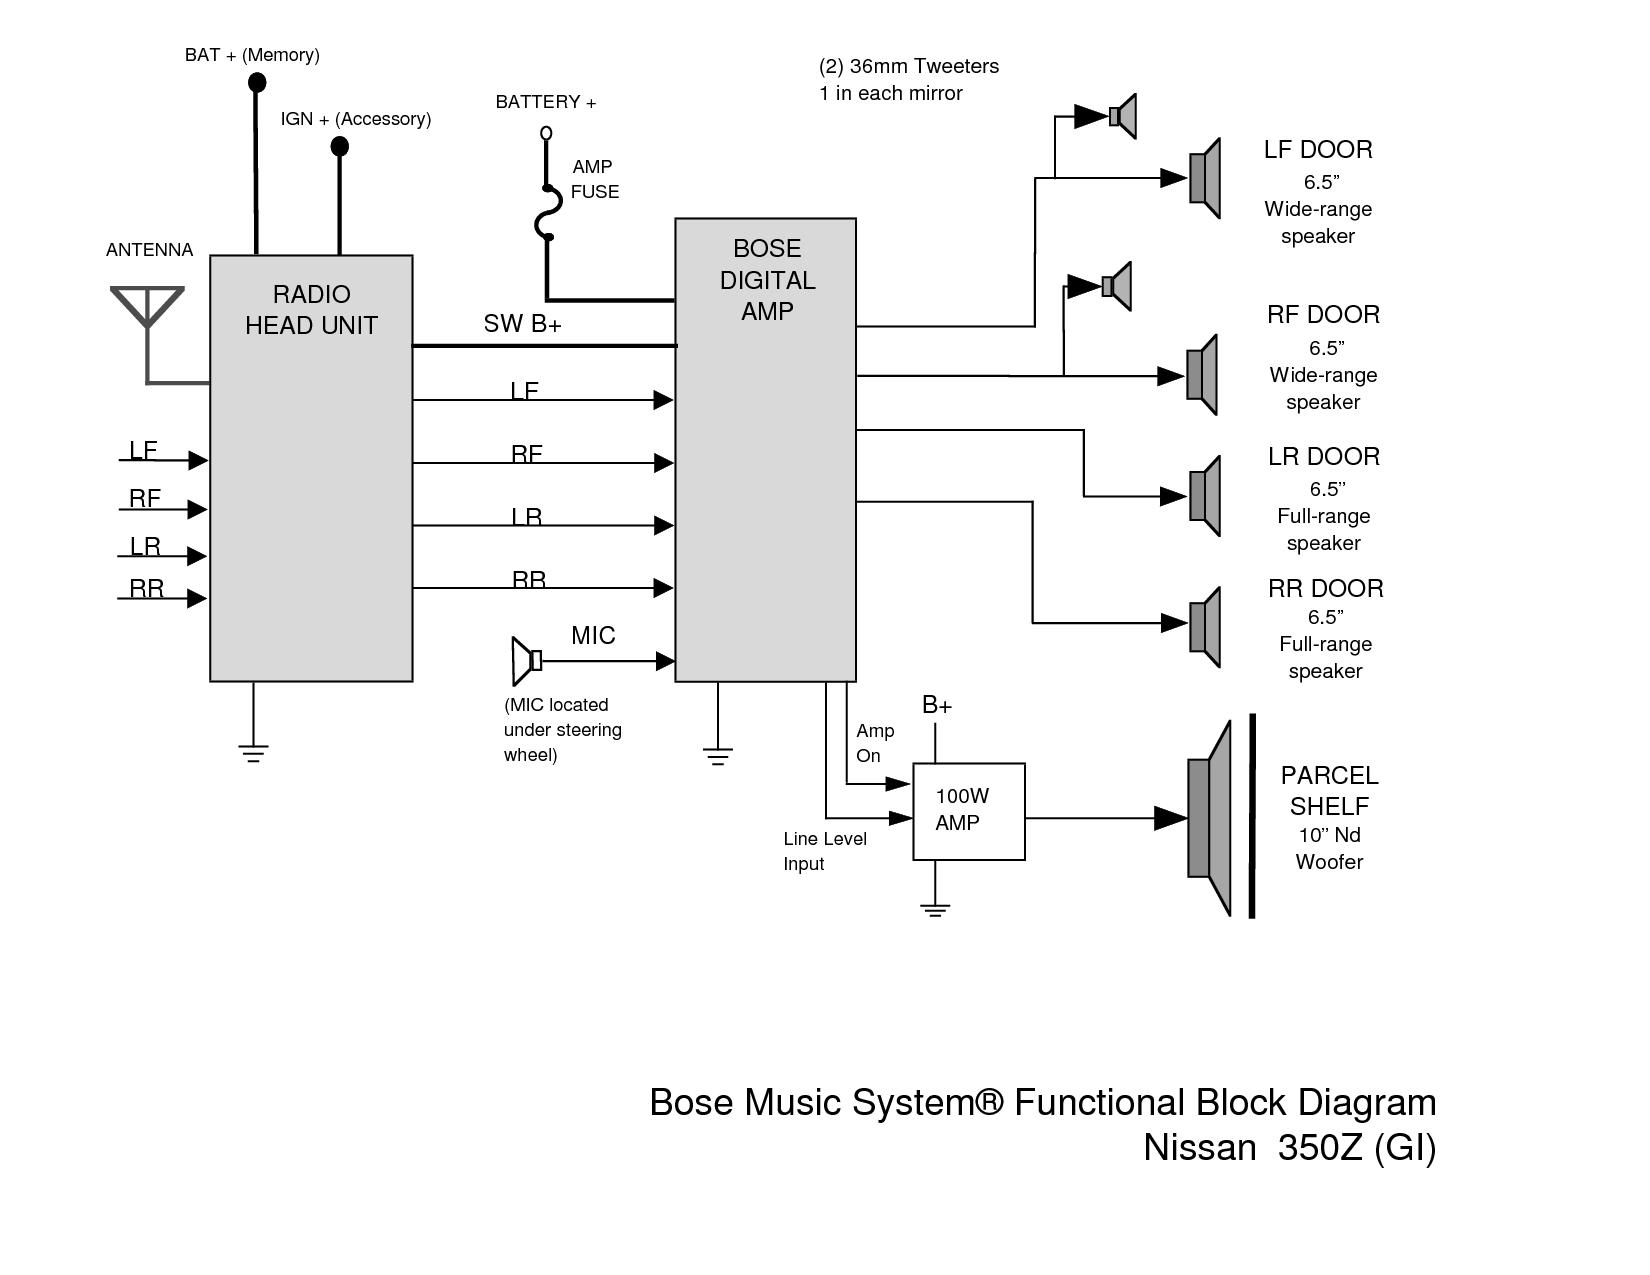 362605d1396434458 03 bose speakers specs 14915844?resize\\\\\\\\\\\\\\\=665%2C514 2000 acura tl radio wiring diagram wiring diagram simonand boss radio wiring diagram at soozxer.org